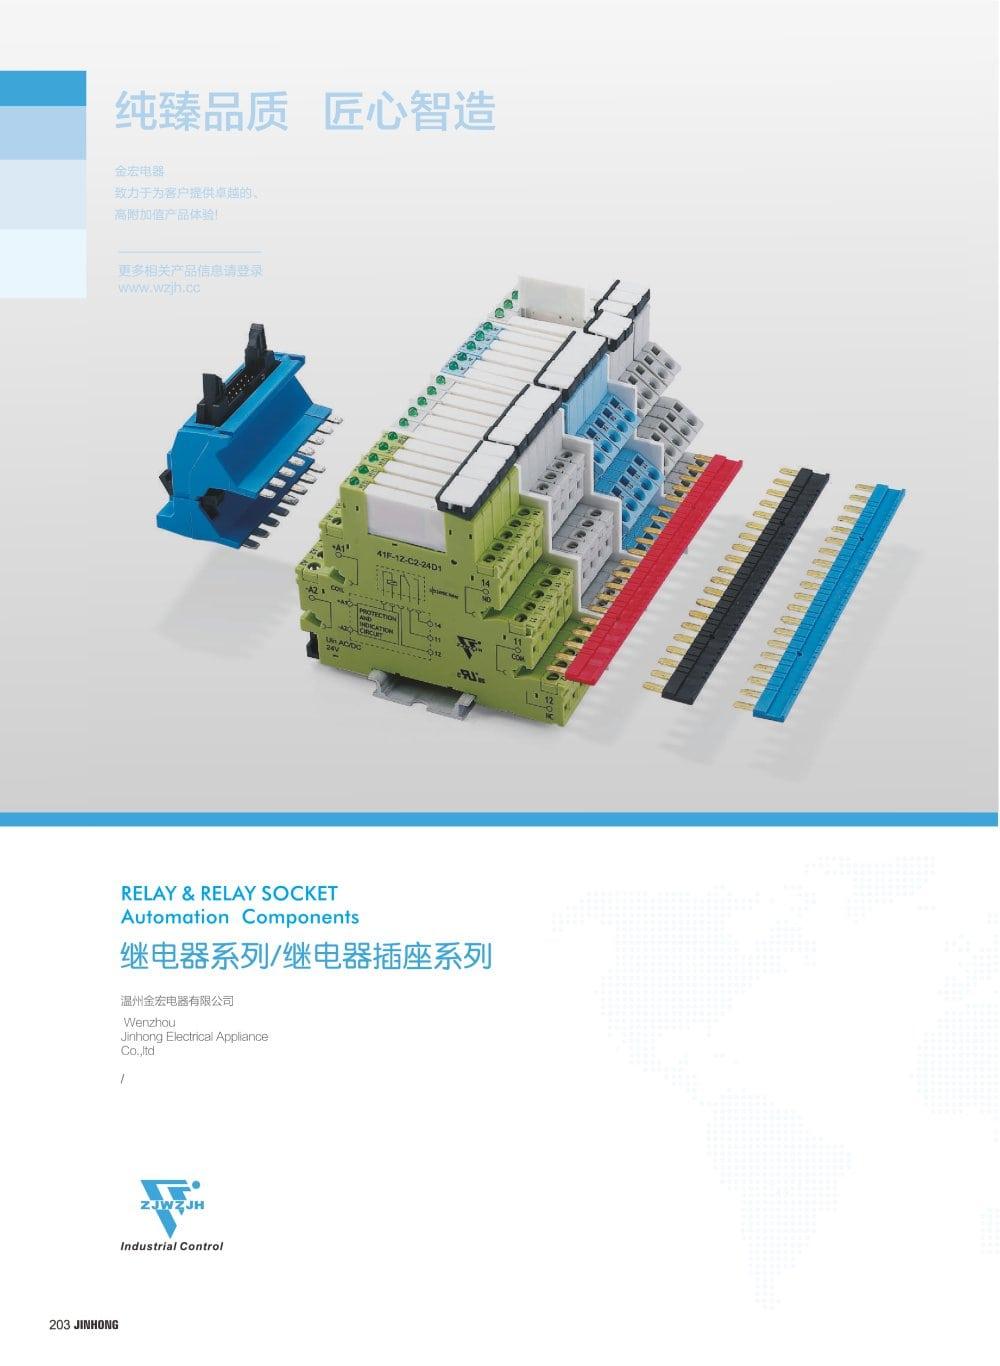 Relay Socket Wenzhou Jinhong Electric Appliance Pdf Vandal Switch Wiring Diagram 1 58 Pages